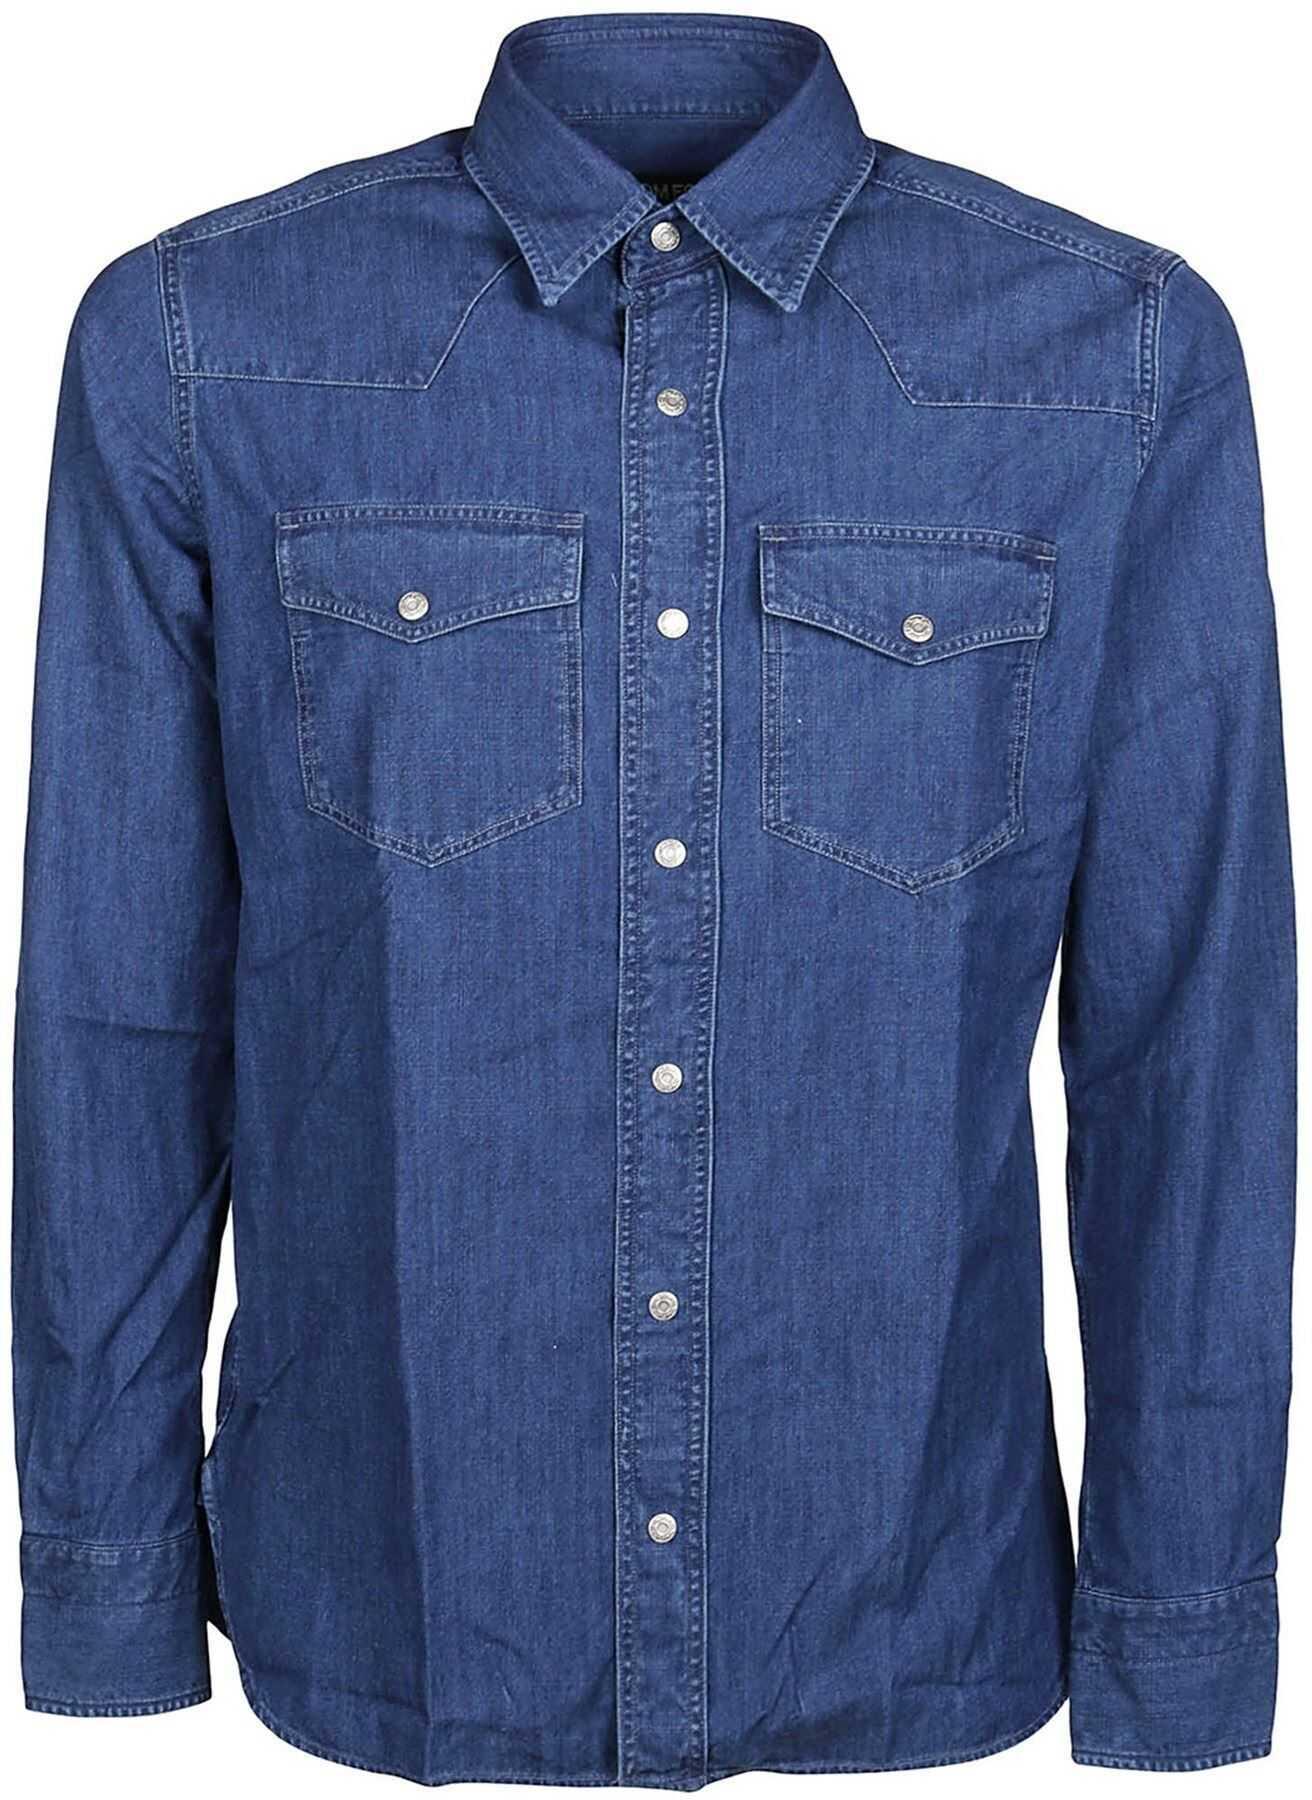 Tom Ford Denim Shirt In Blue Blue imagine